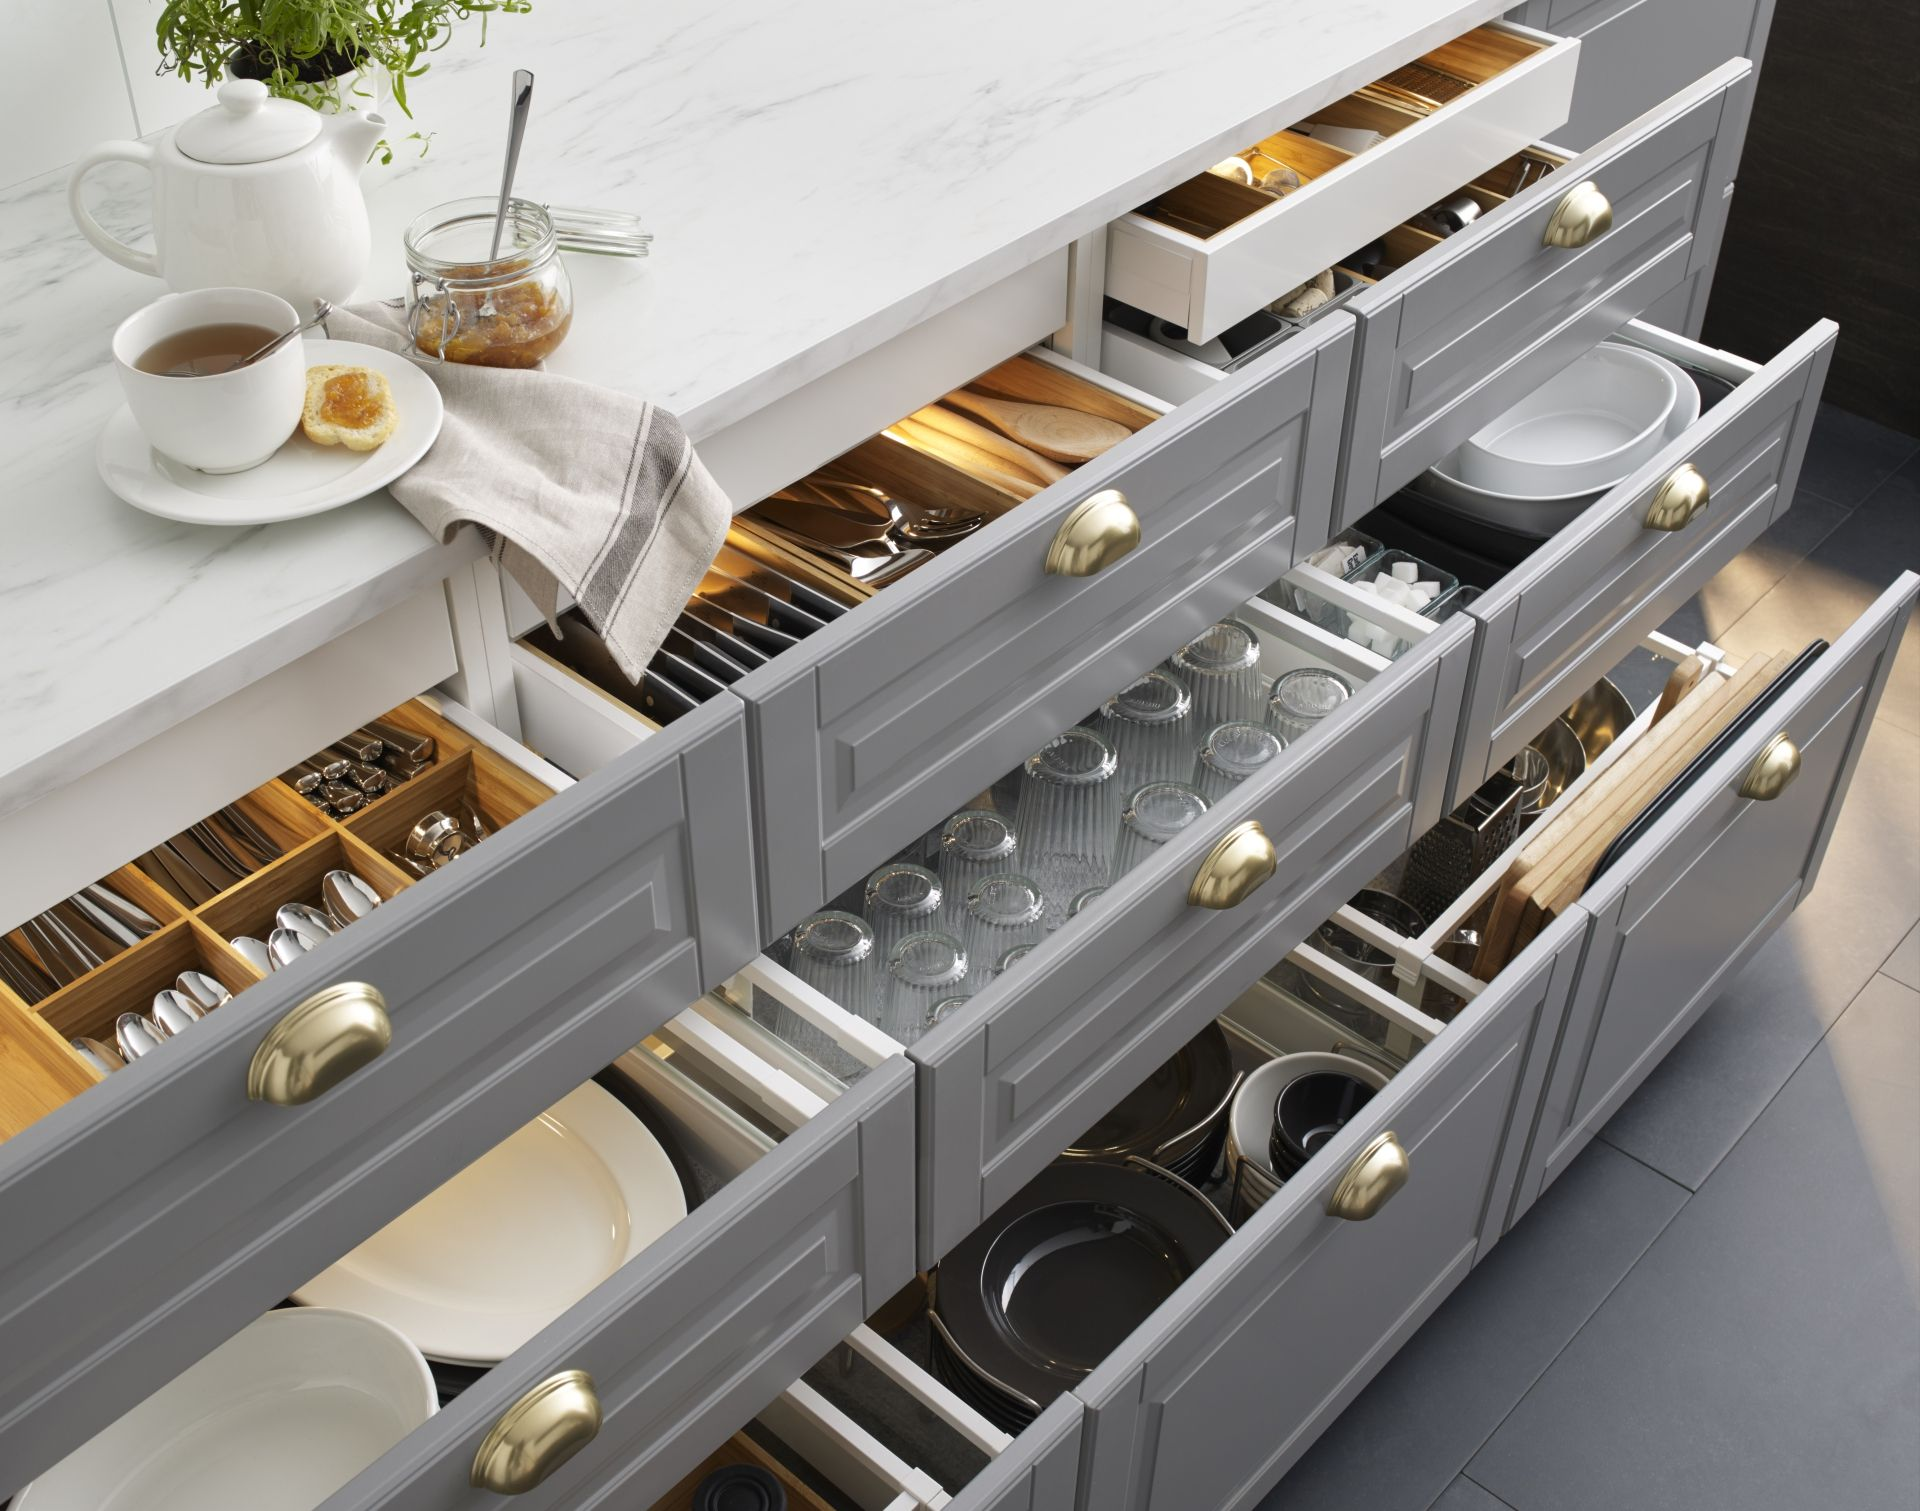 Keukenkast Ophangen Ikea : Maximera lade ikea ikeanl ikeanederland metod serie keuken lades